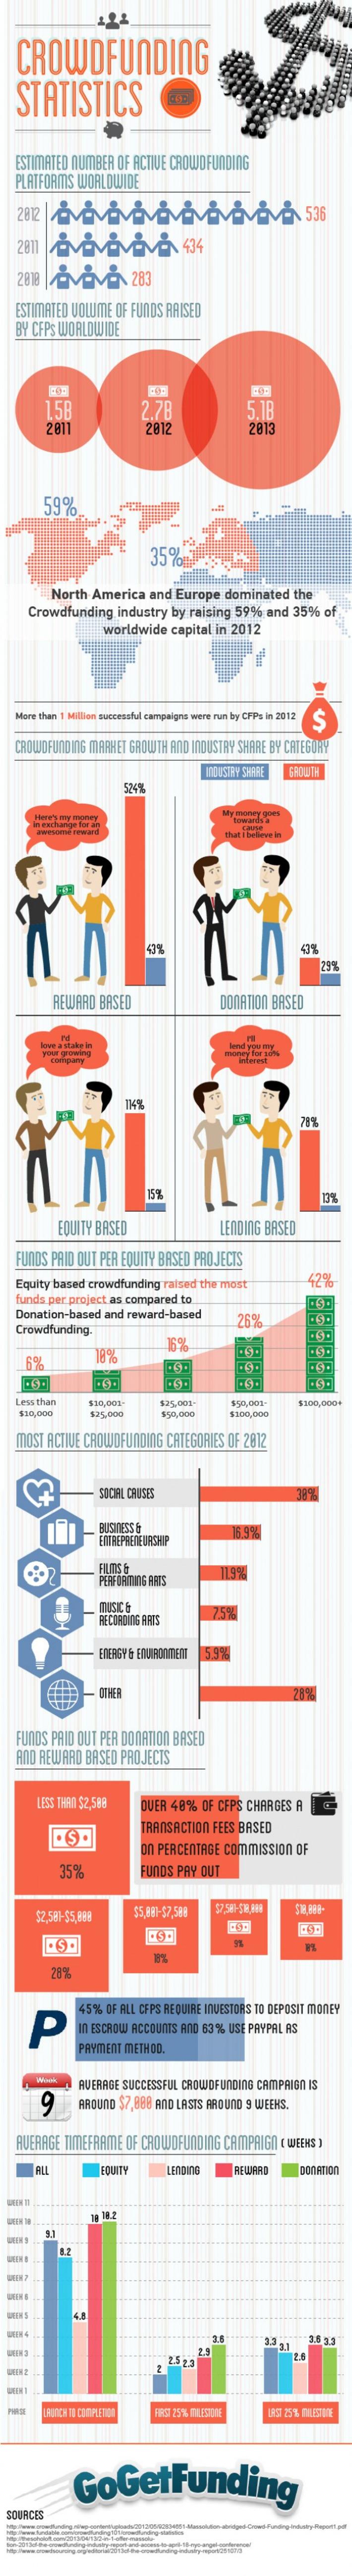 Les derniers statistiques du crowdfunding   Solutions locales   Scoop.it